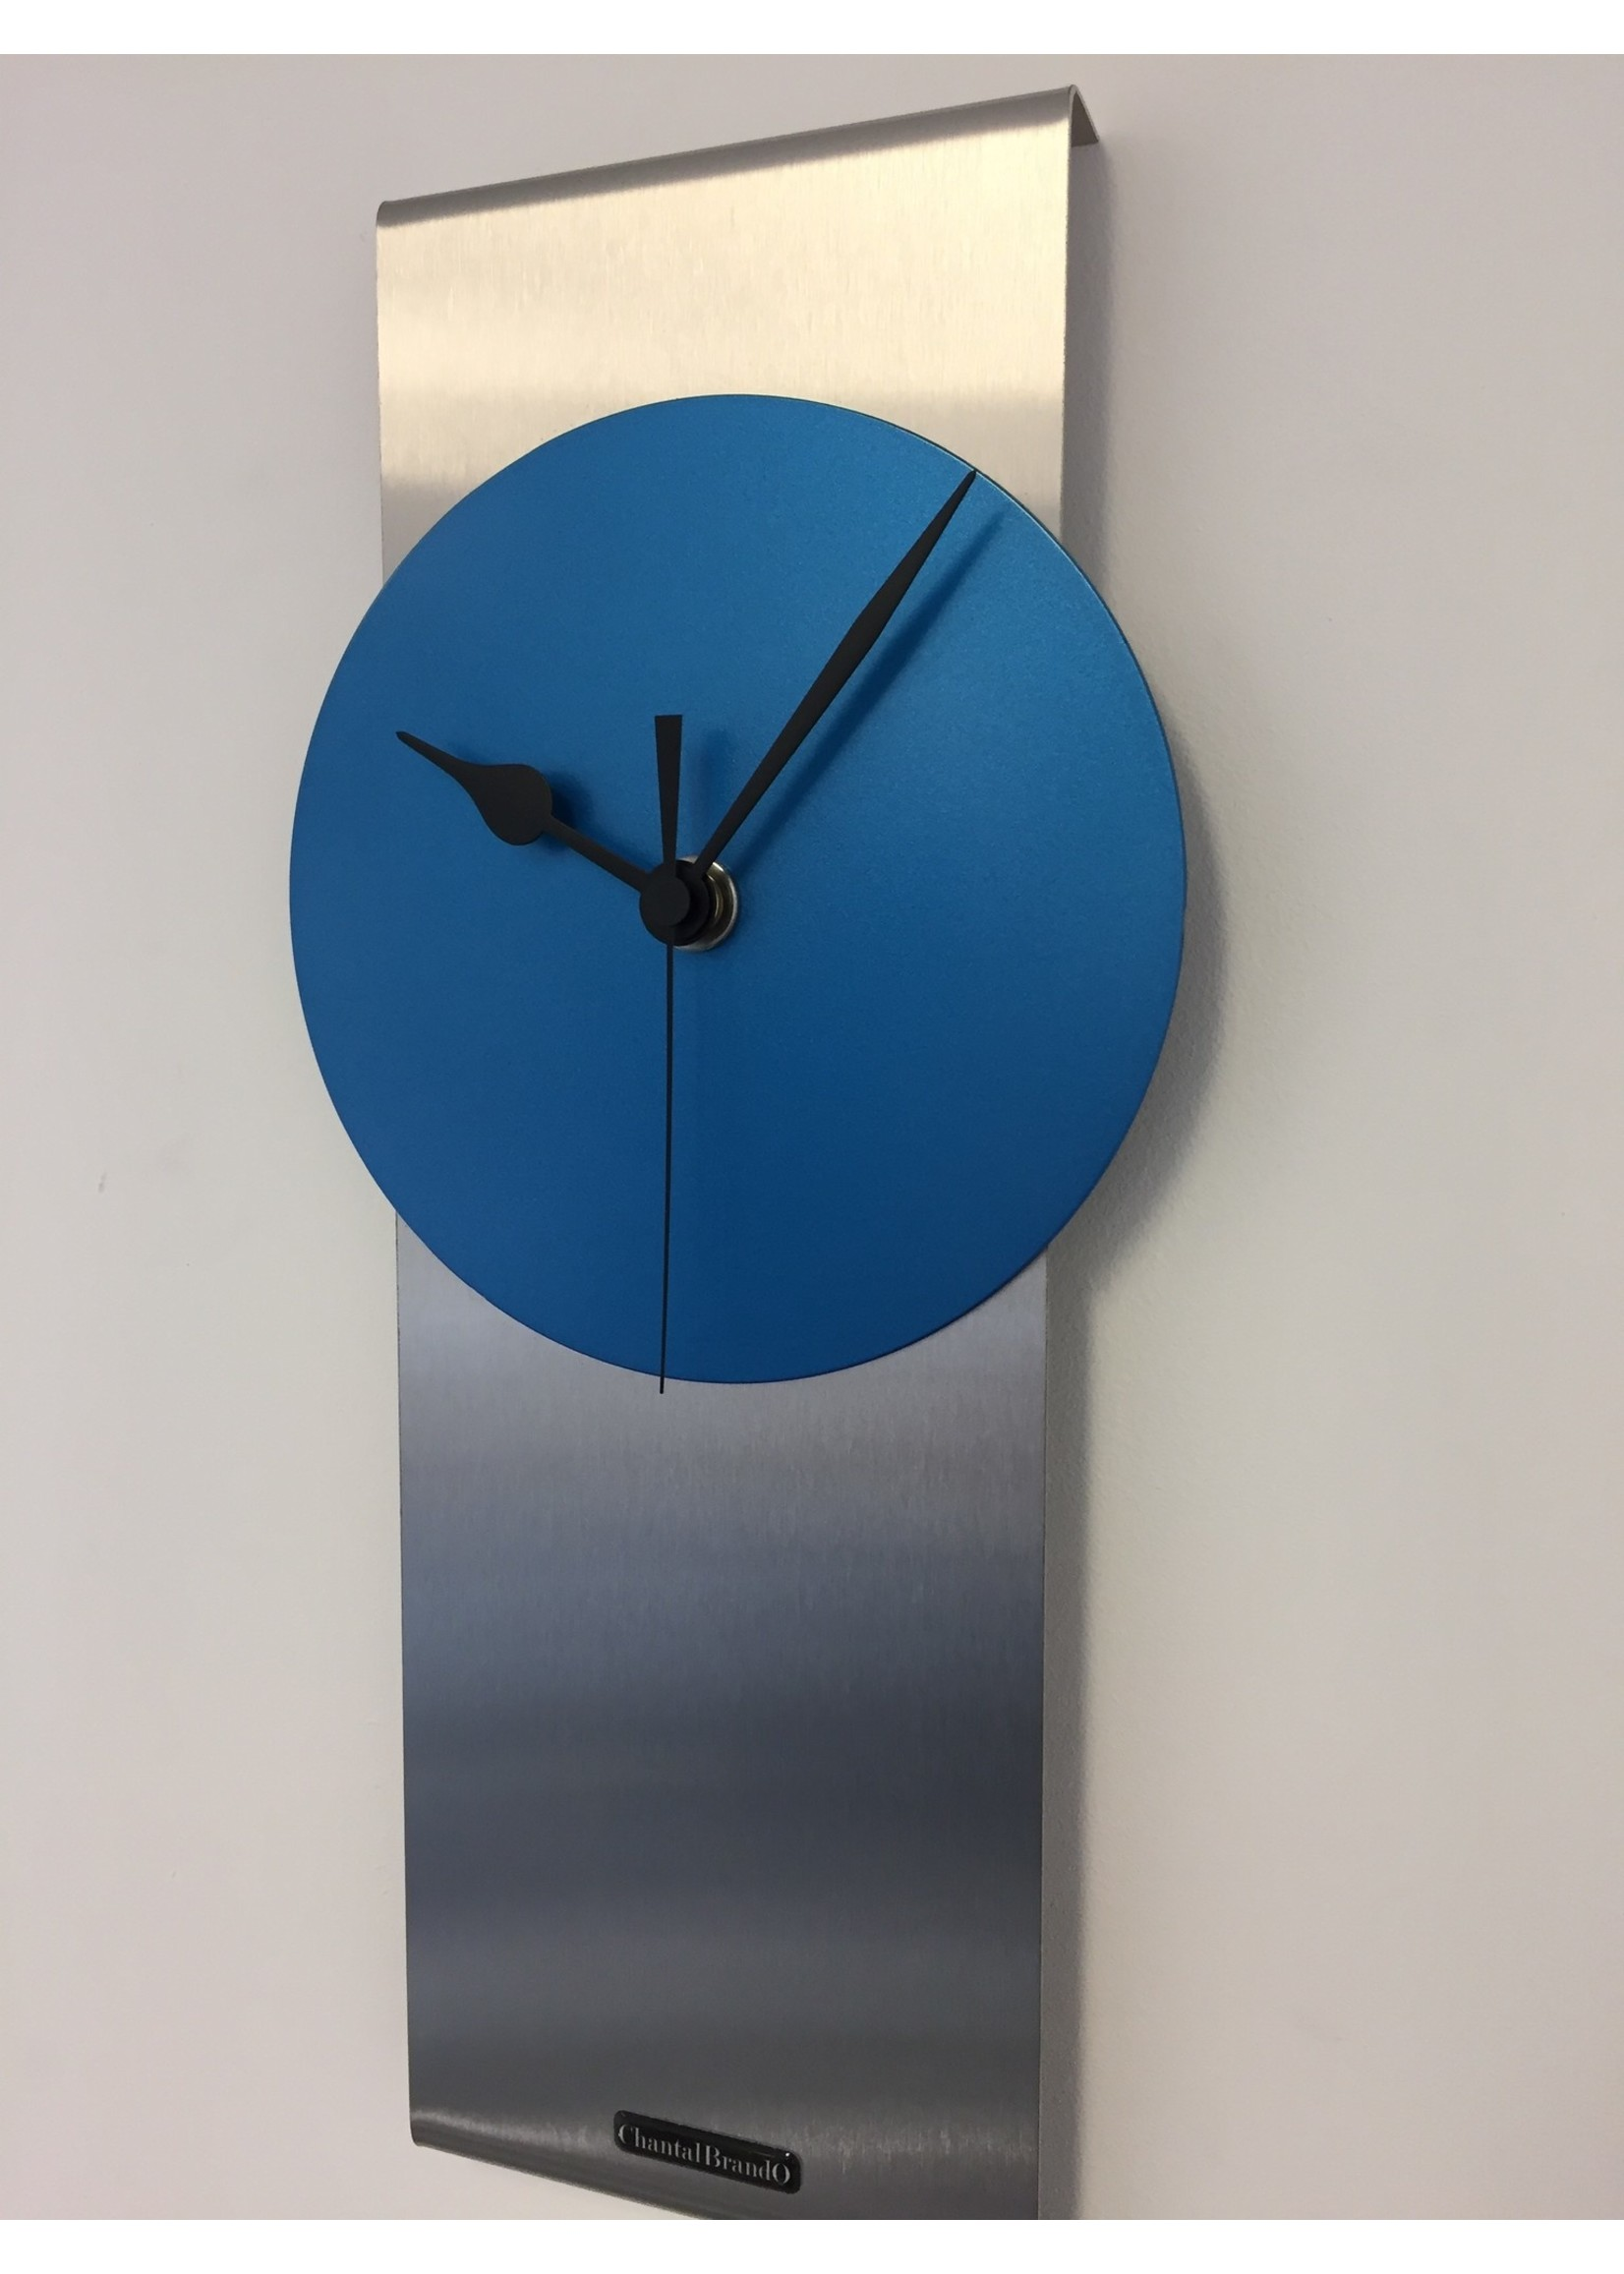 ChantalBrandO Wandklok ChantalBrando ARTIC BLUE modern design